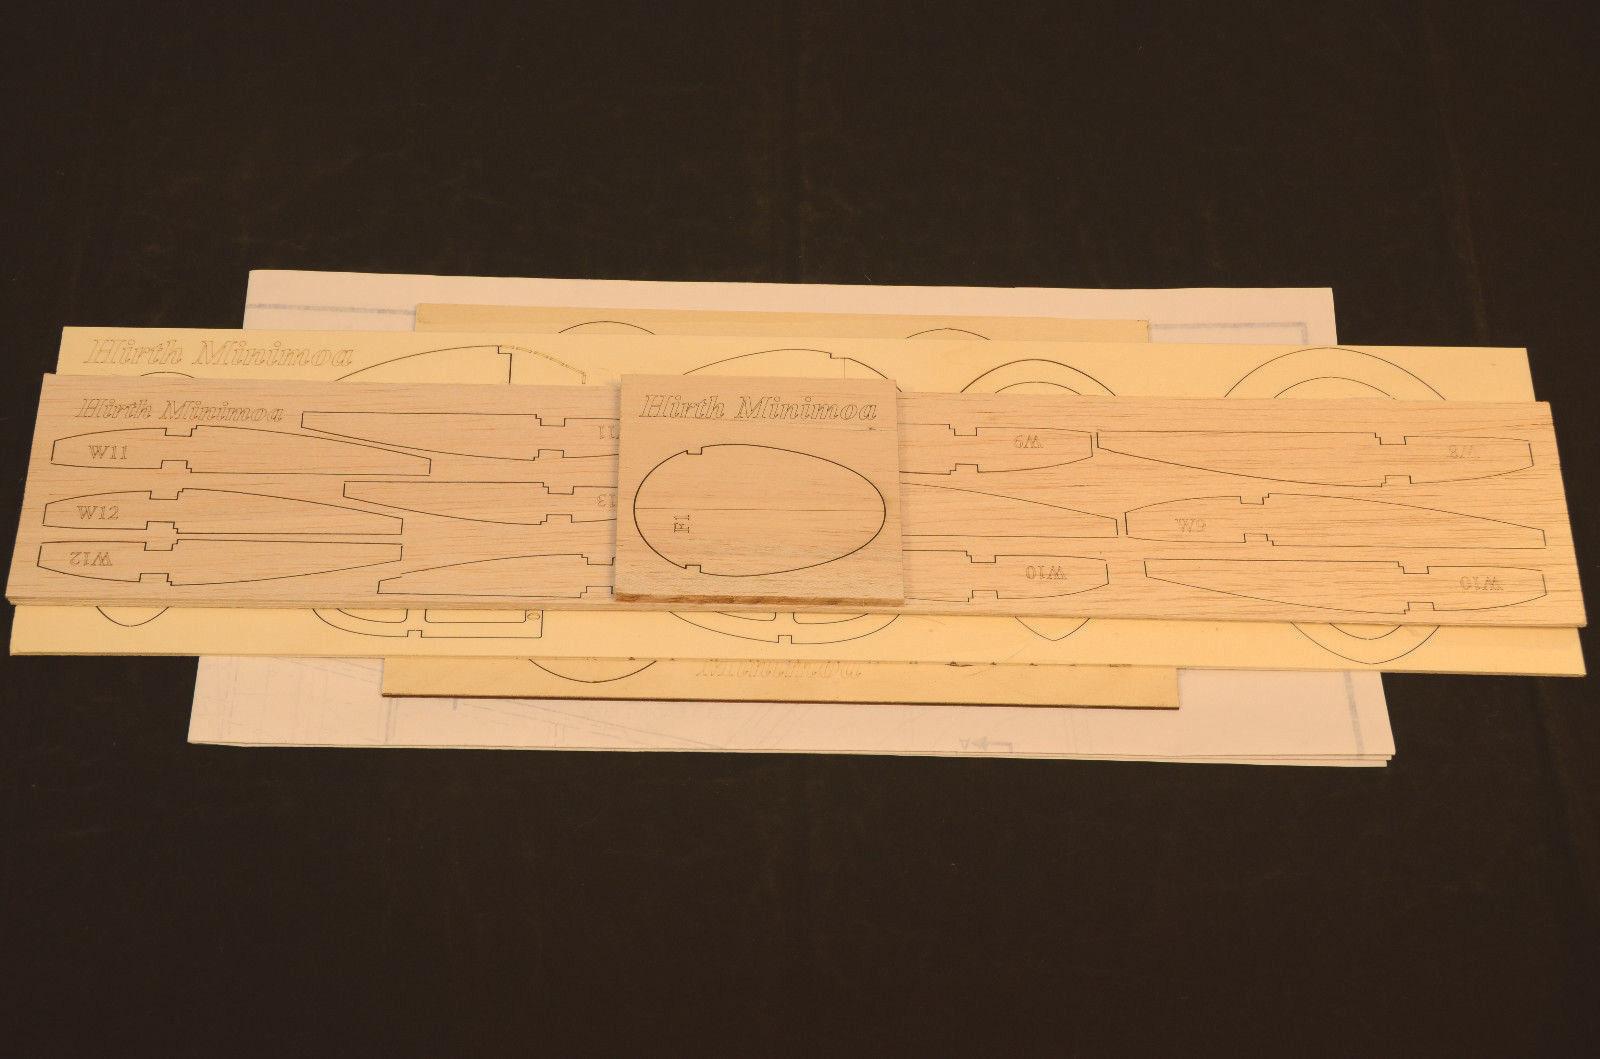 1 6 Escala Hirth Minimoa Corte Láser Kit, Planes & Instrucción 105  Ws Planeador